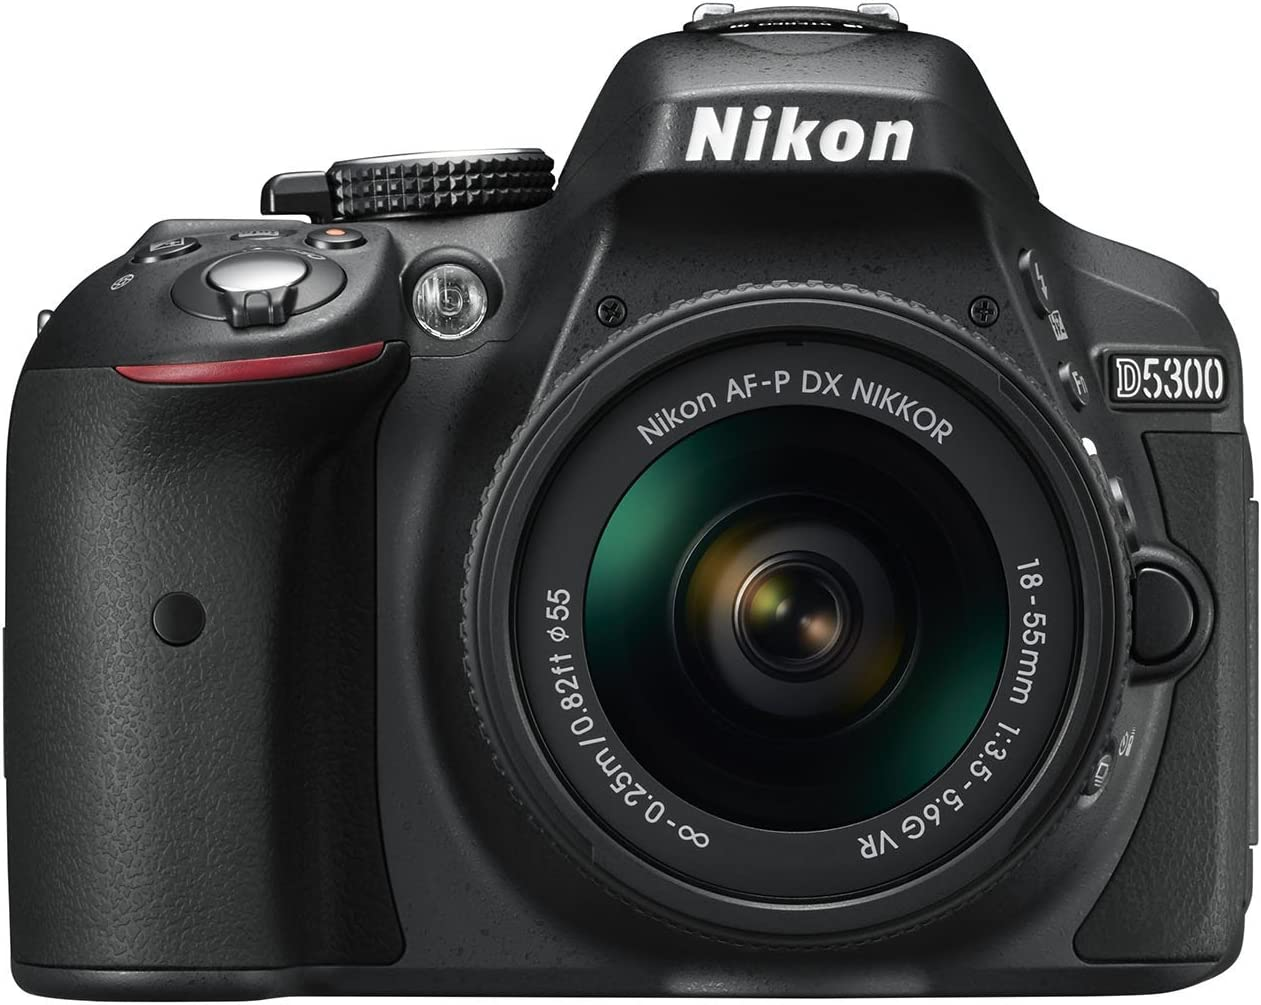 Nikon D5300 18-55/3.5-5.6 AF-P G DX VR - Cámara Digital: Amazon.es ...